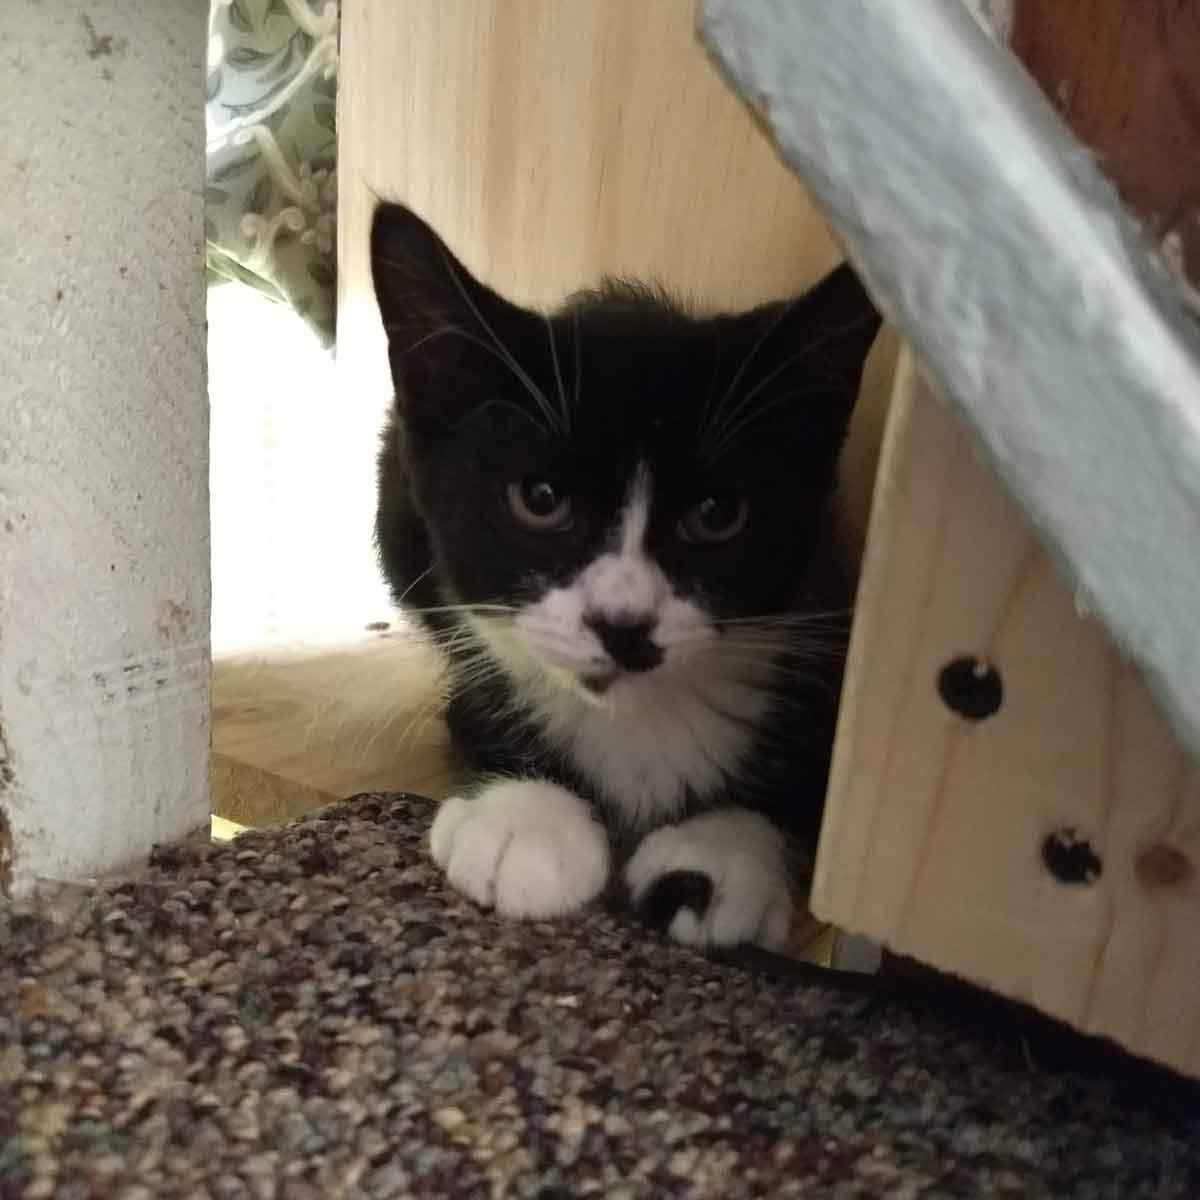 Black & White ~9wk old foster kitten posing on stairs